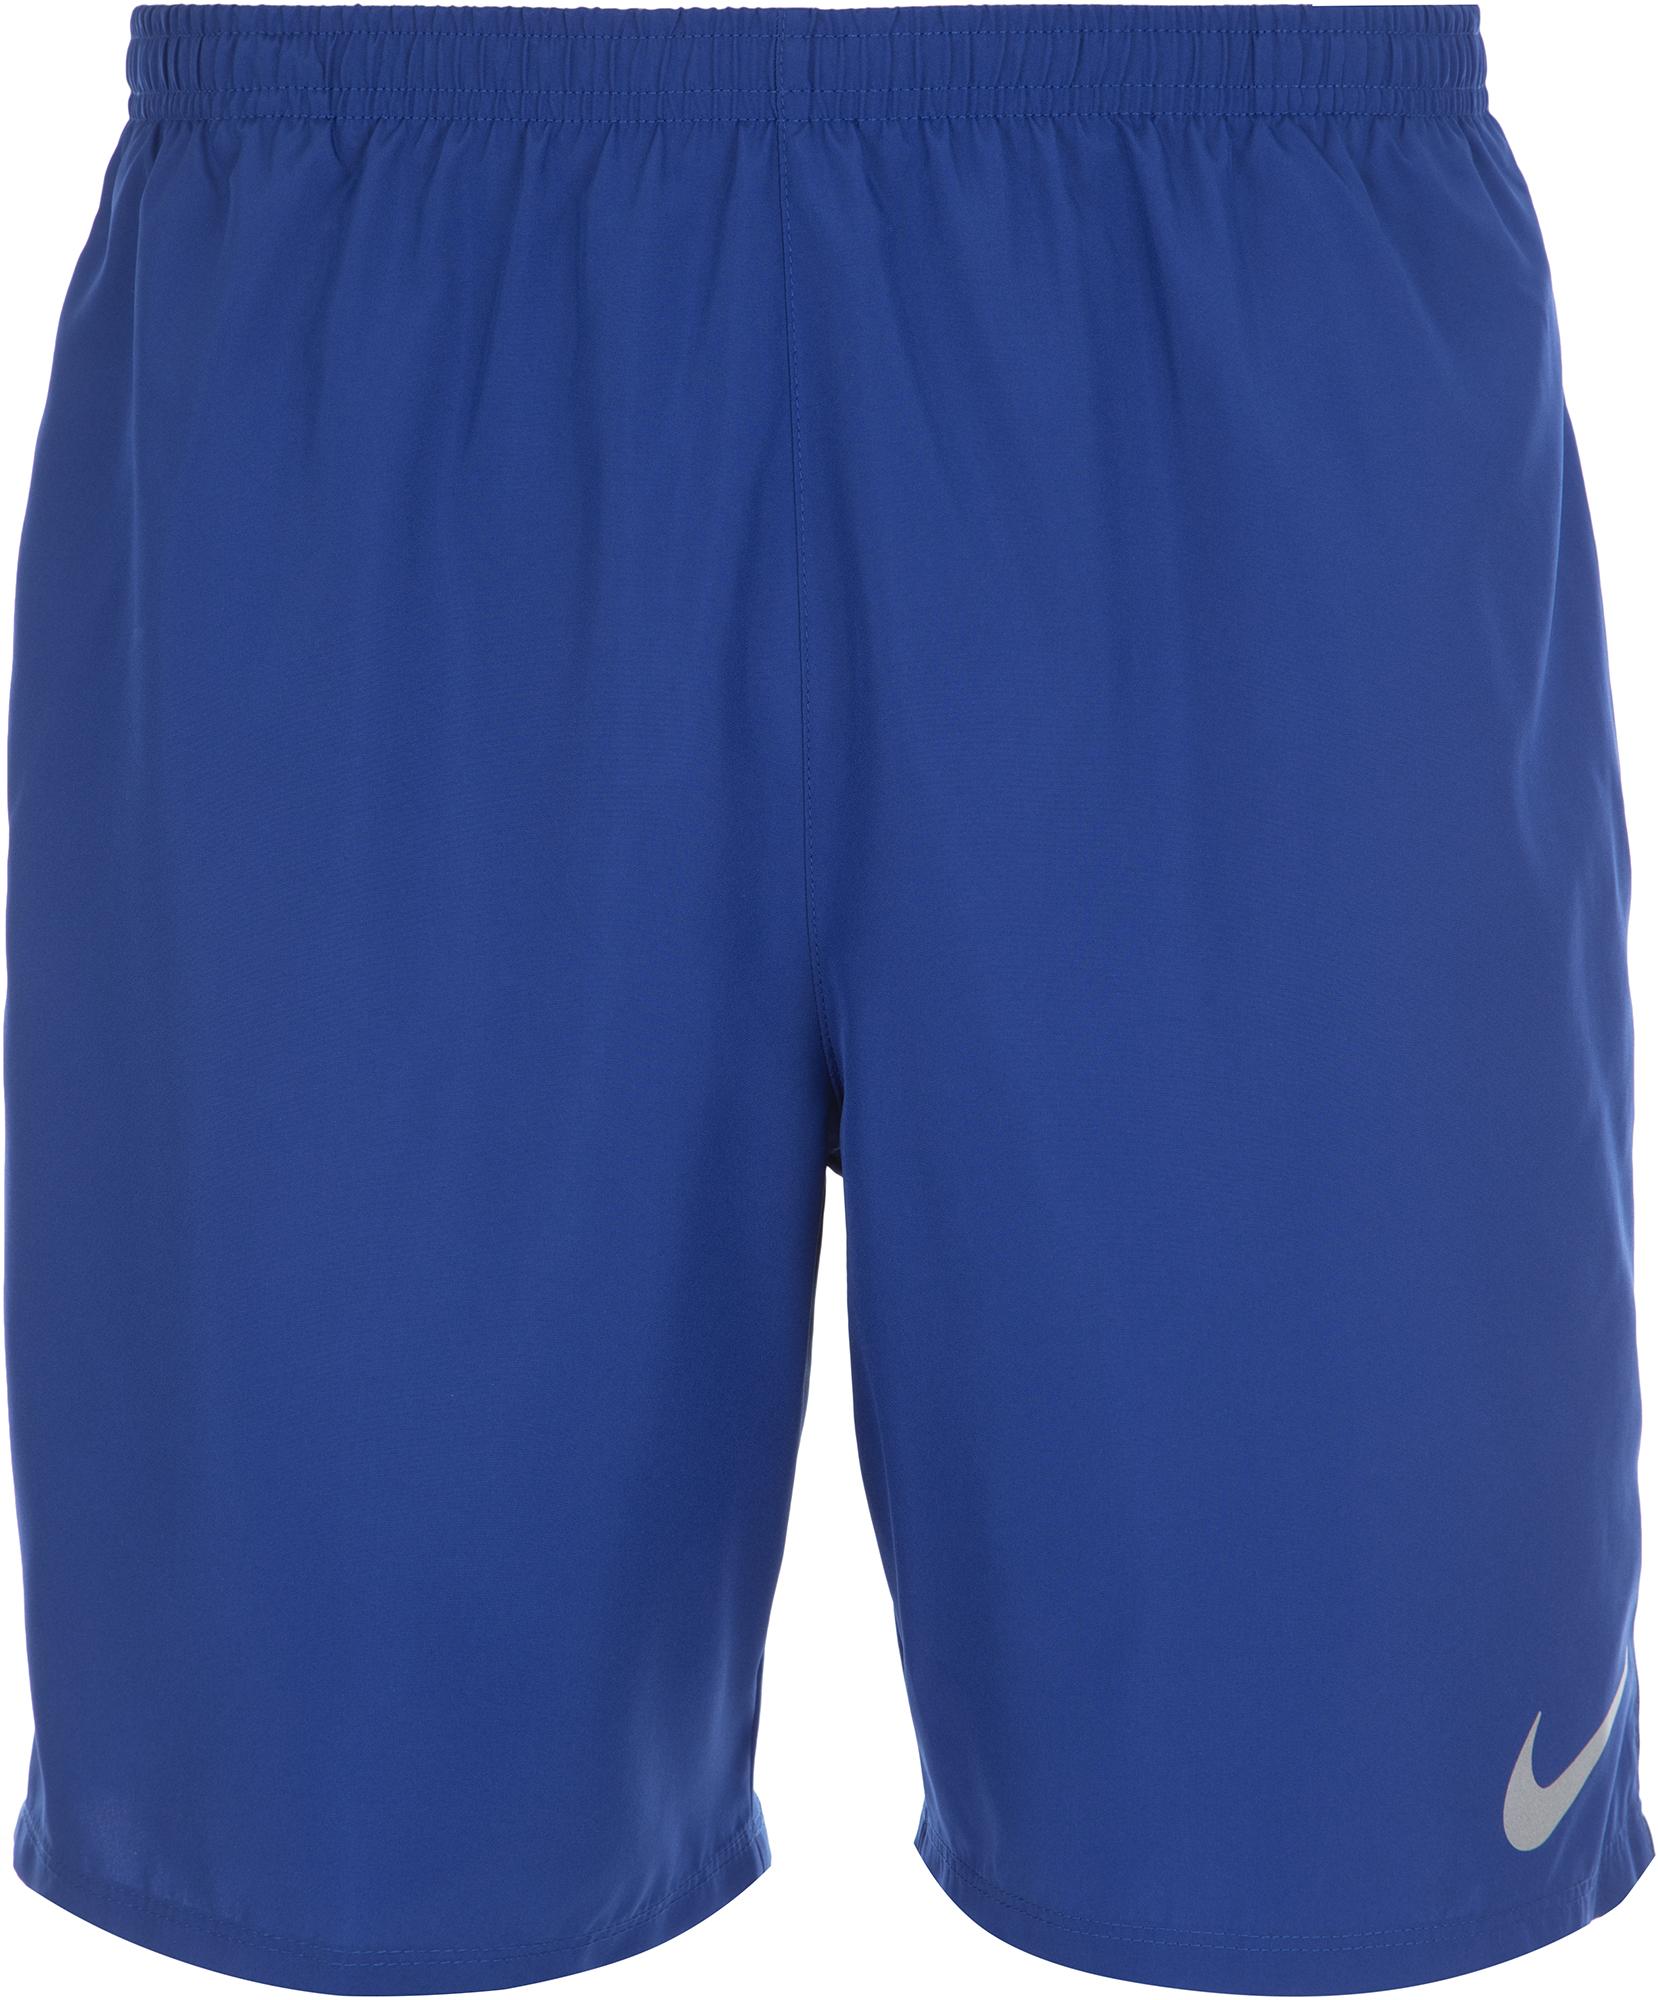 Nike Шорты мужские Nike, размер 52-54